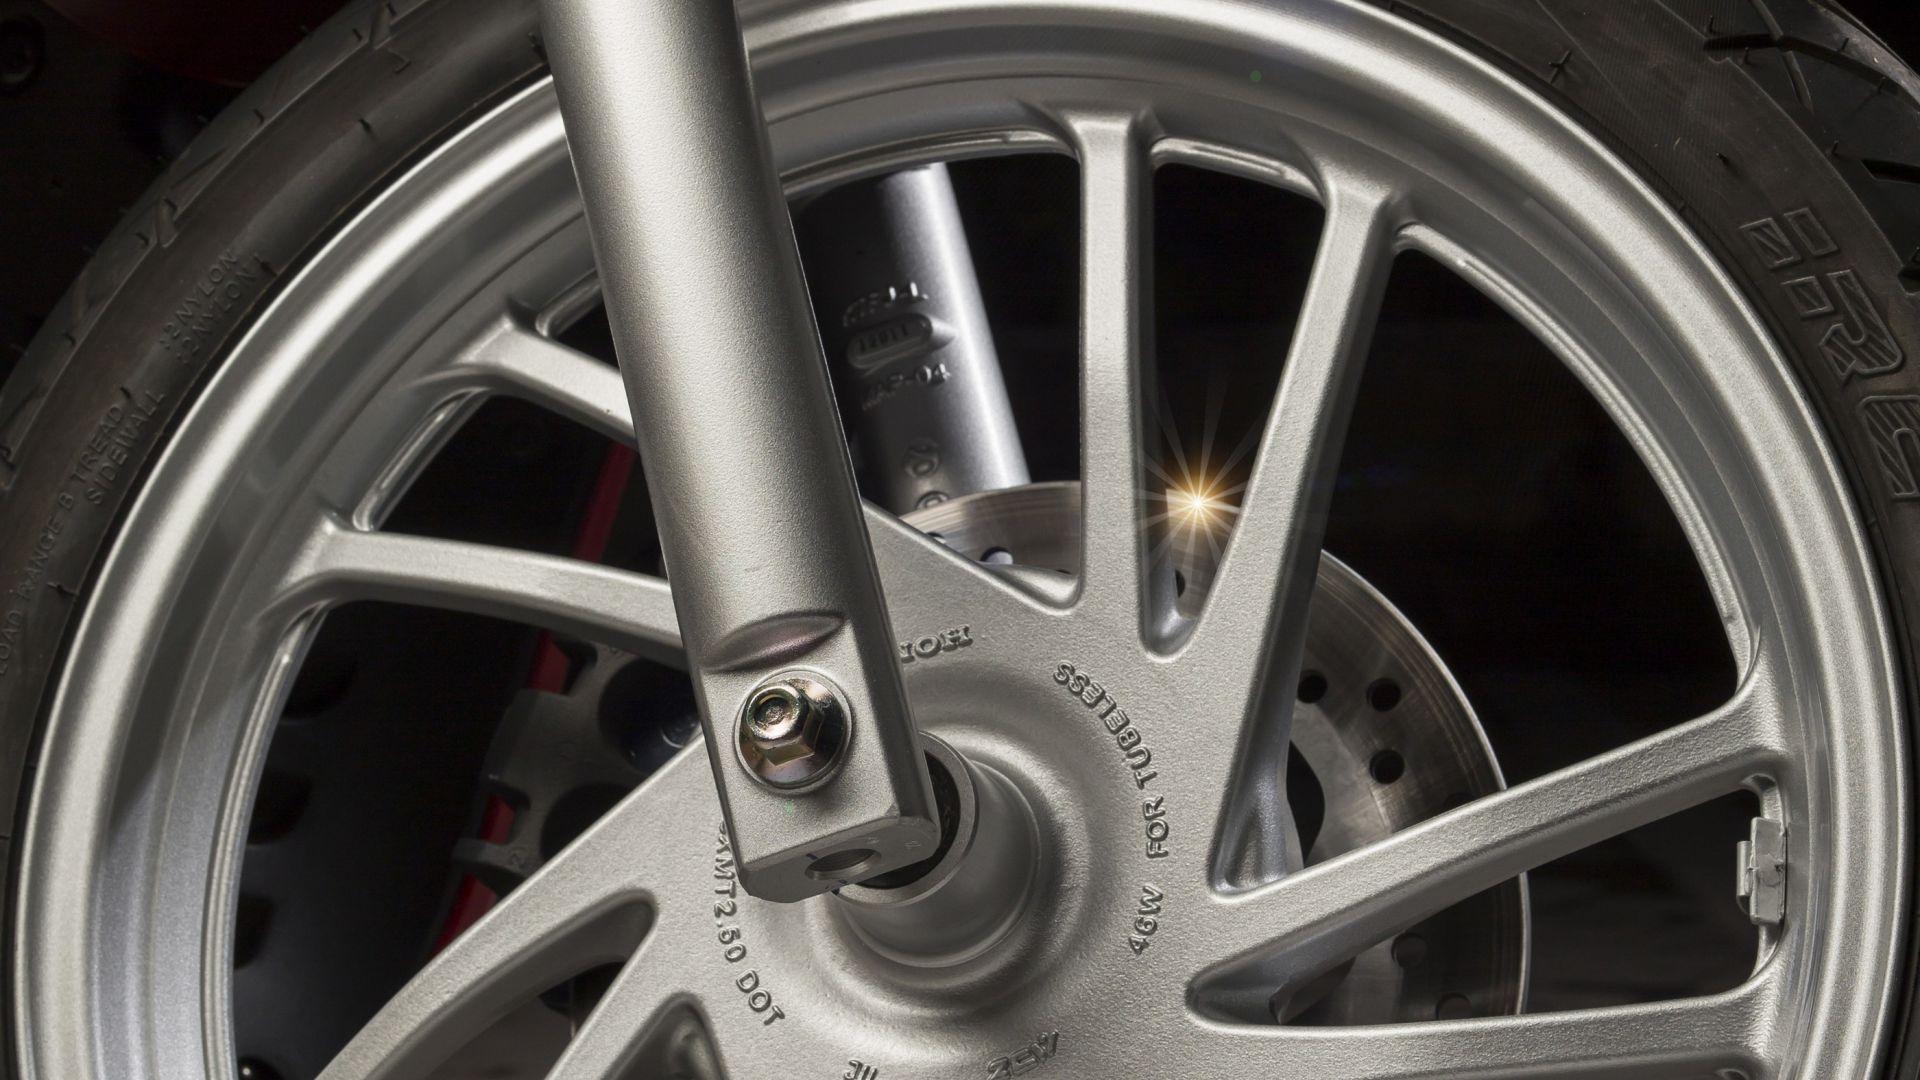 Immagine 4: Honda SH 125/150i ABS 2013